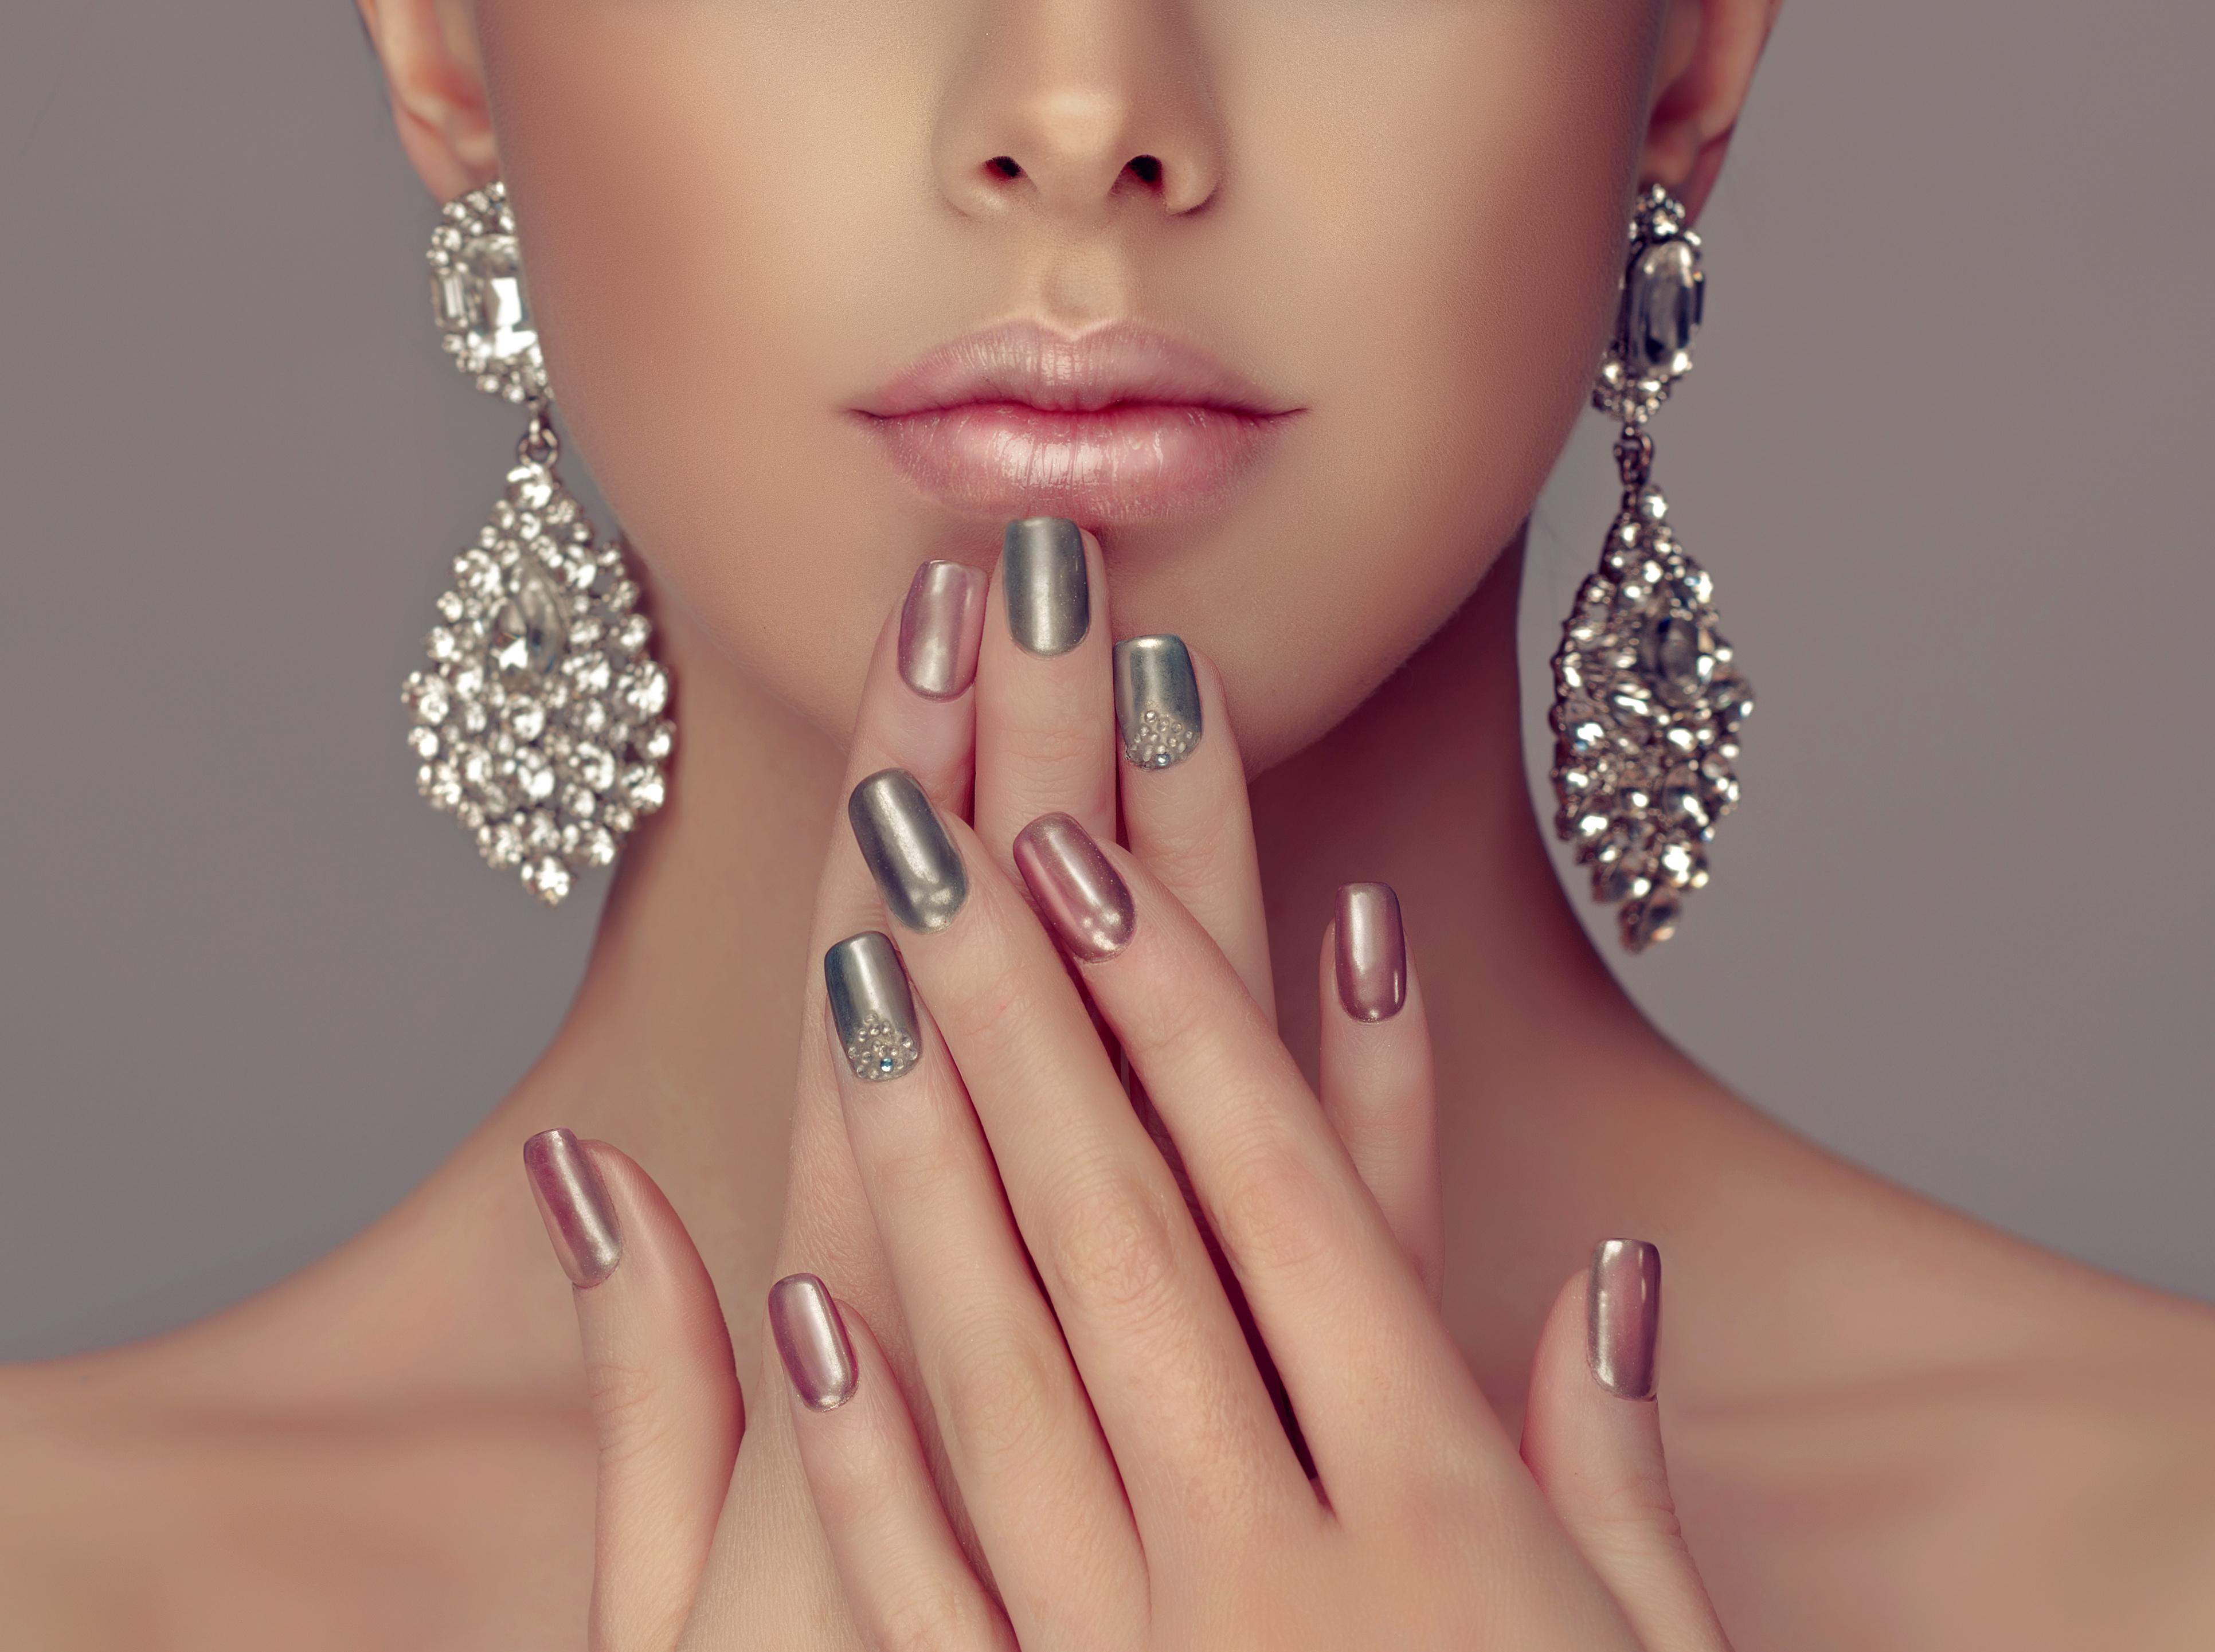 Картинки ногти с девушкой